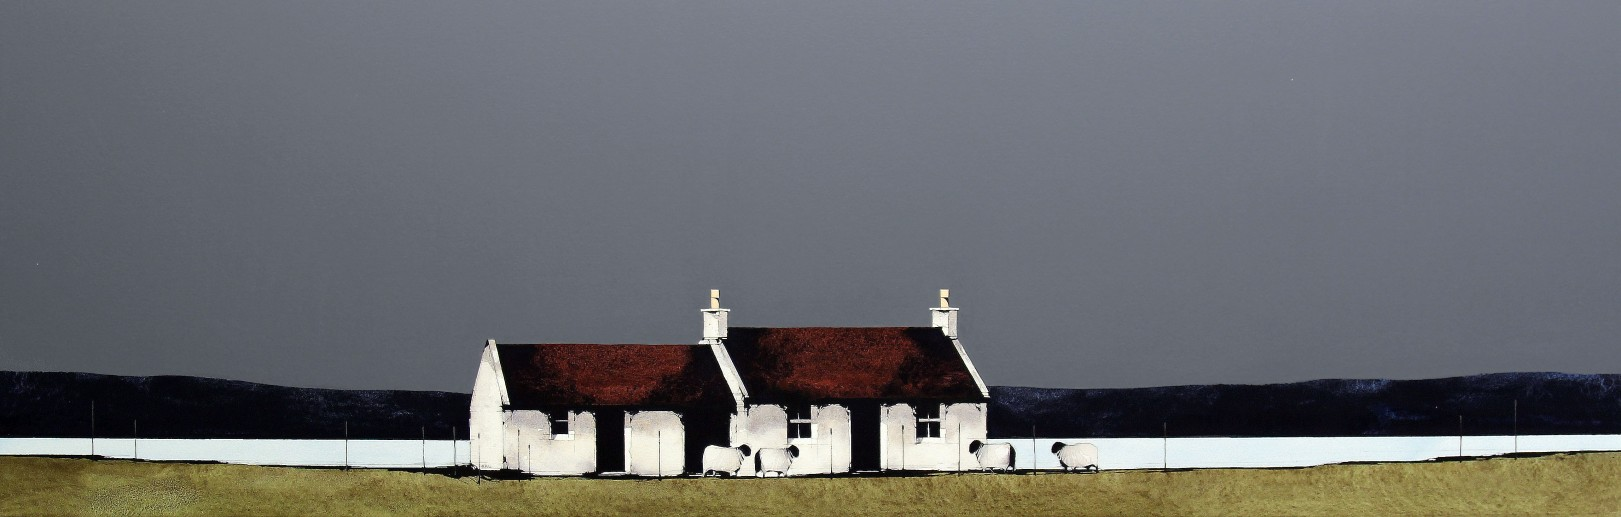 Ron Lawson_Cottage at Ardcharnich, Ullapool_EAS598_Watercolour & Gouache_13x38.5